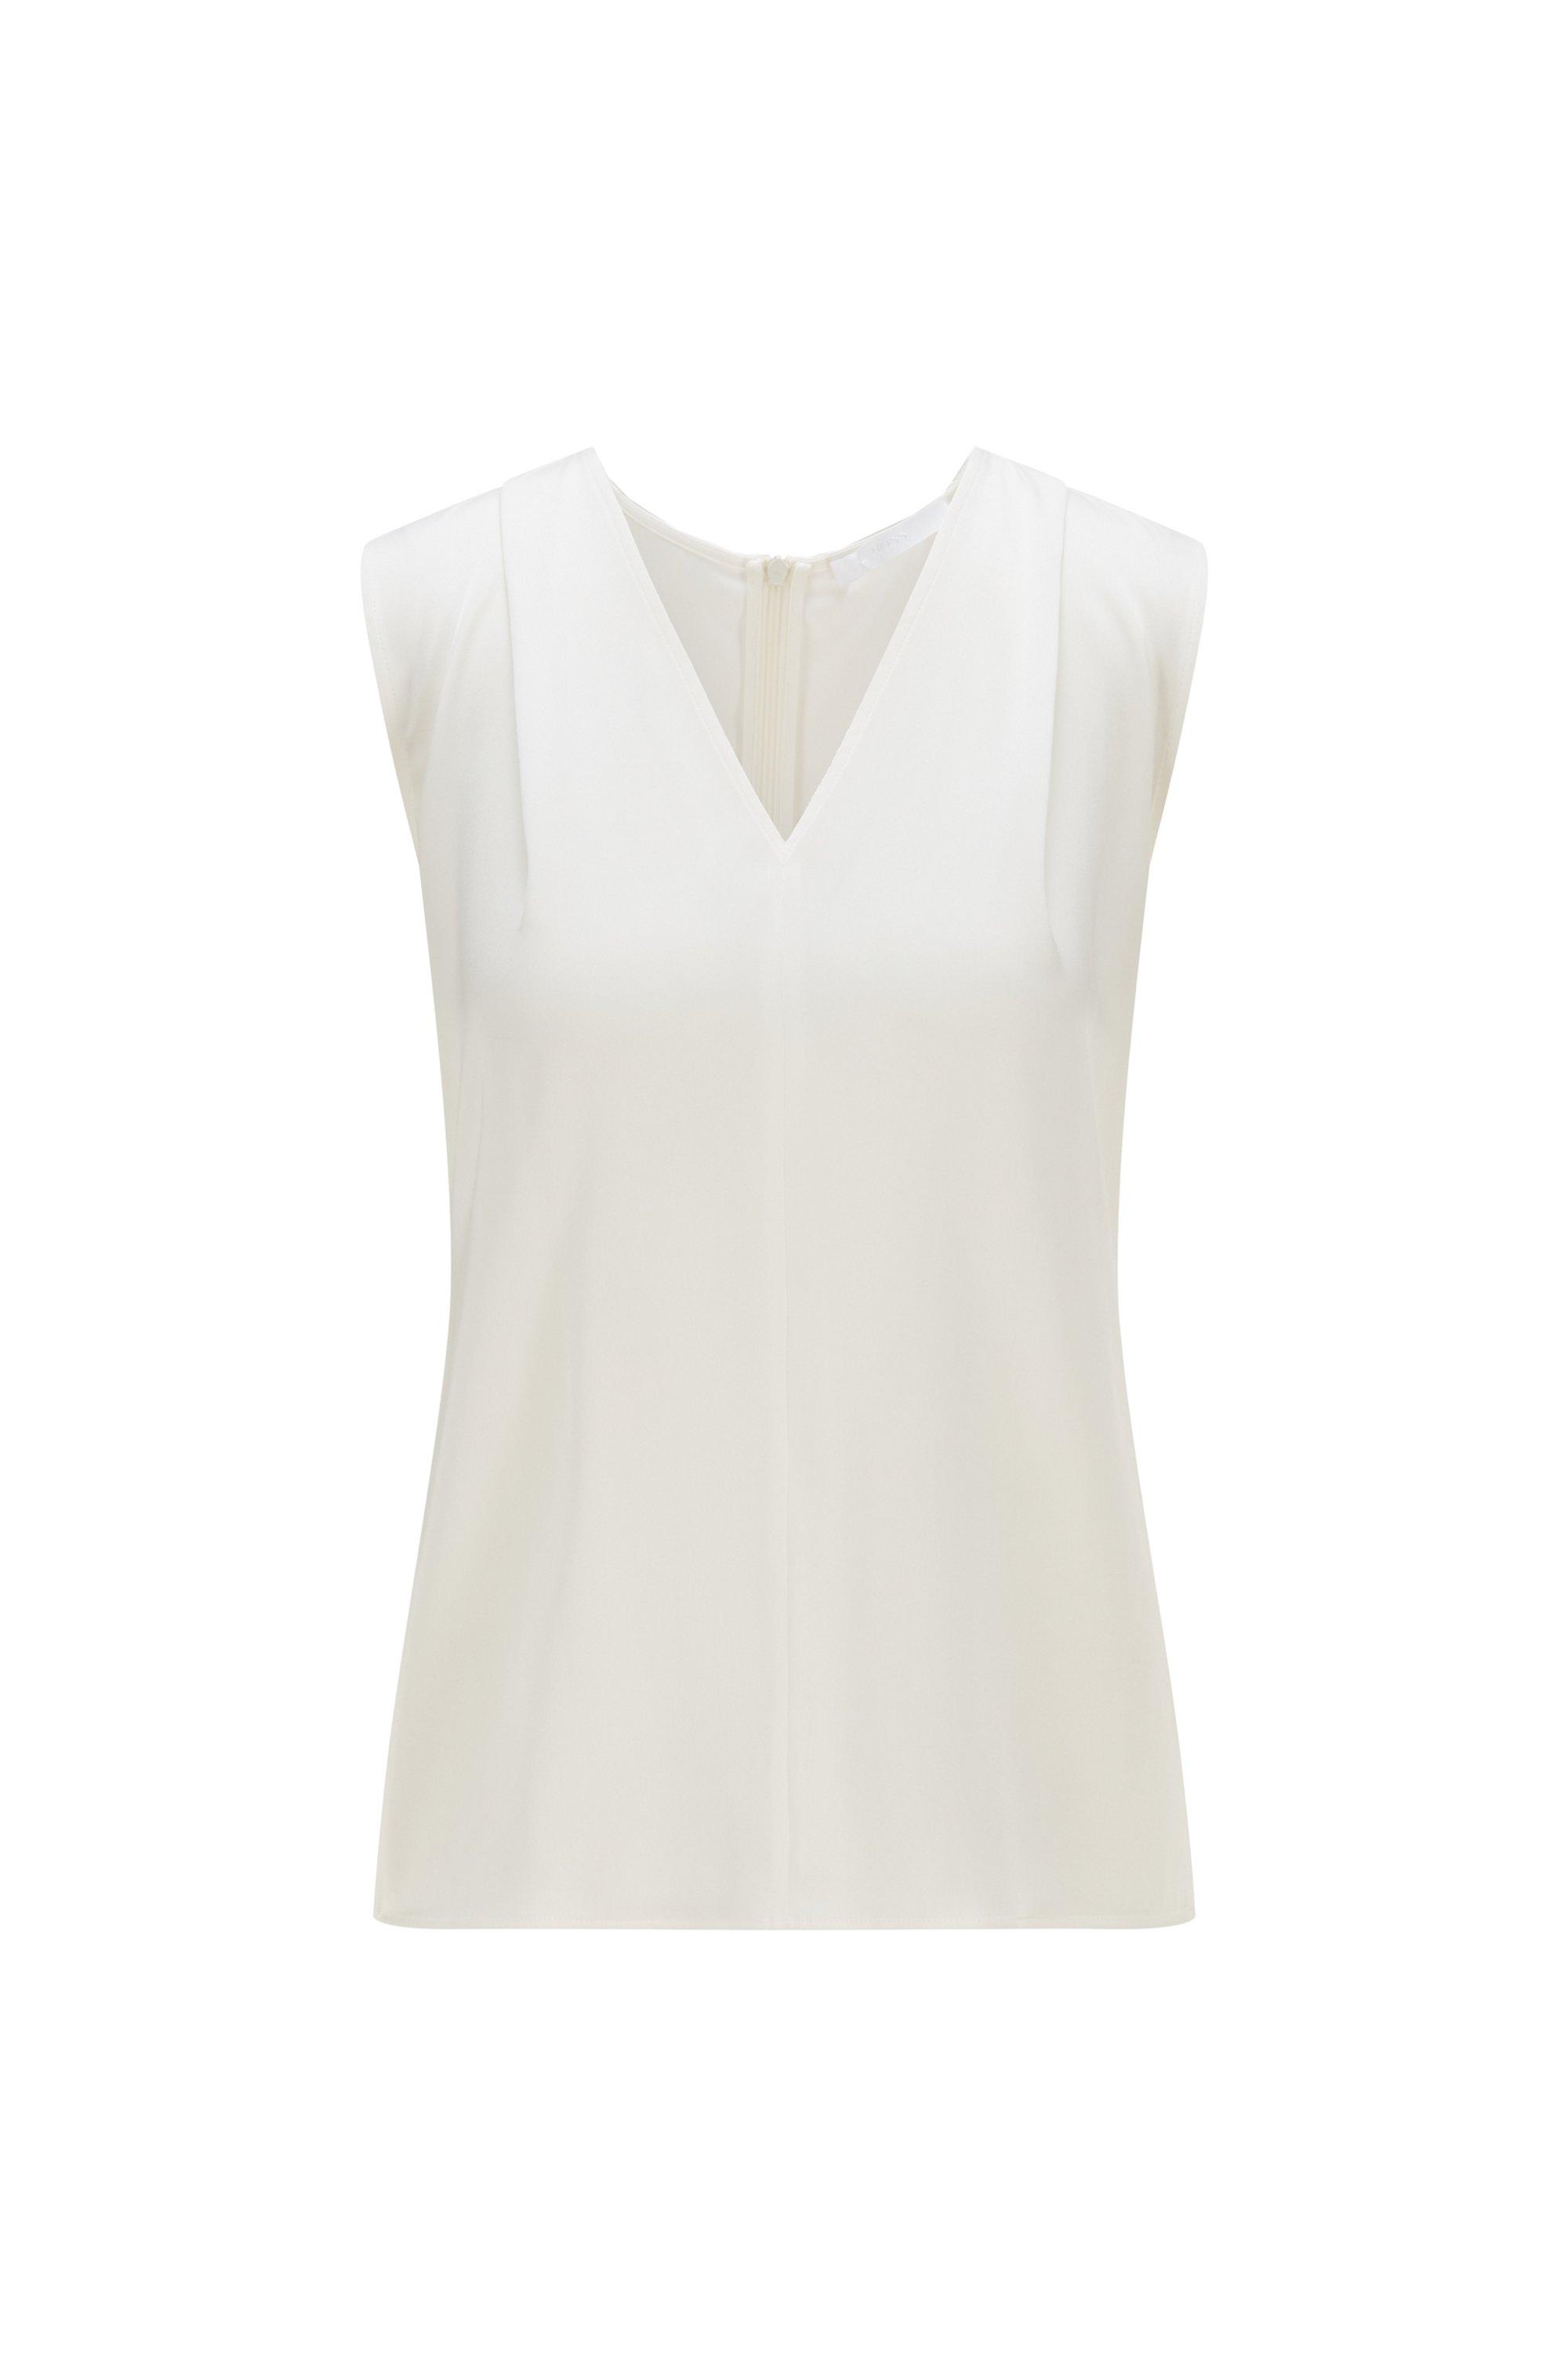 Sleeveless V-neck top in crepe de chine, White